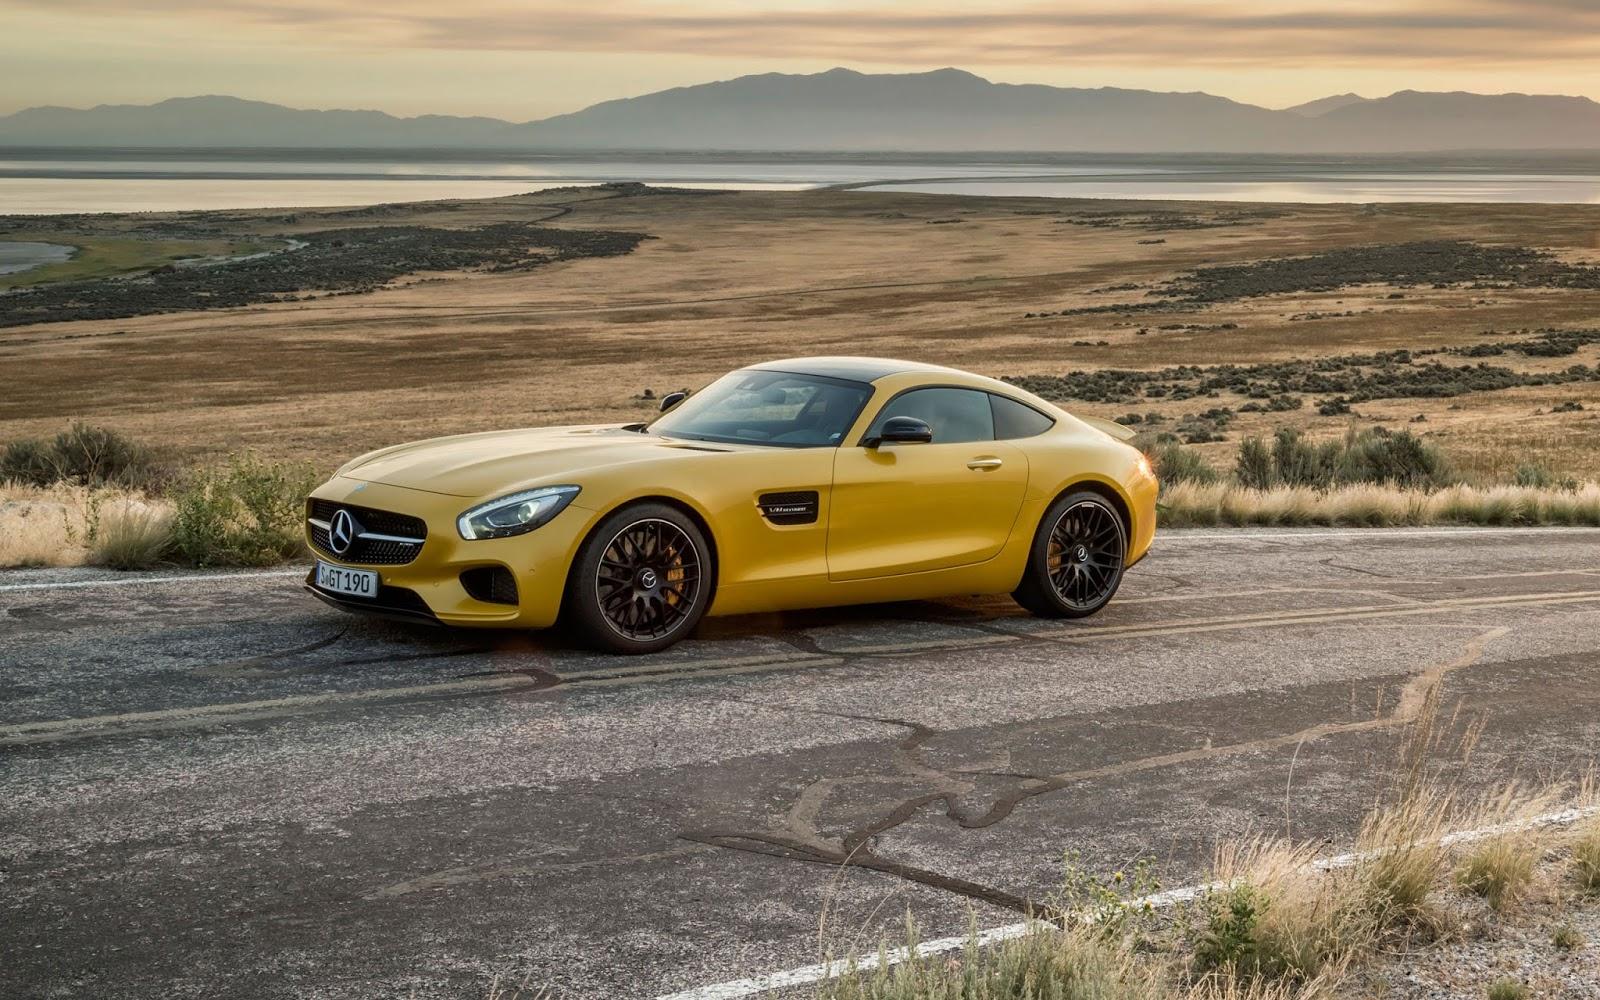 Best Luxury Sports Car